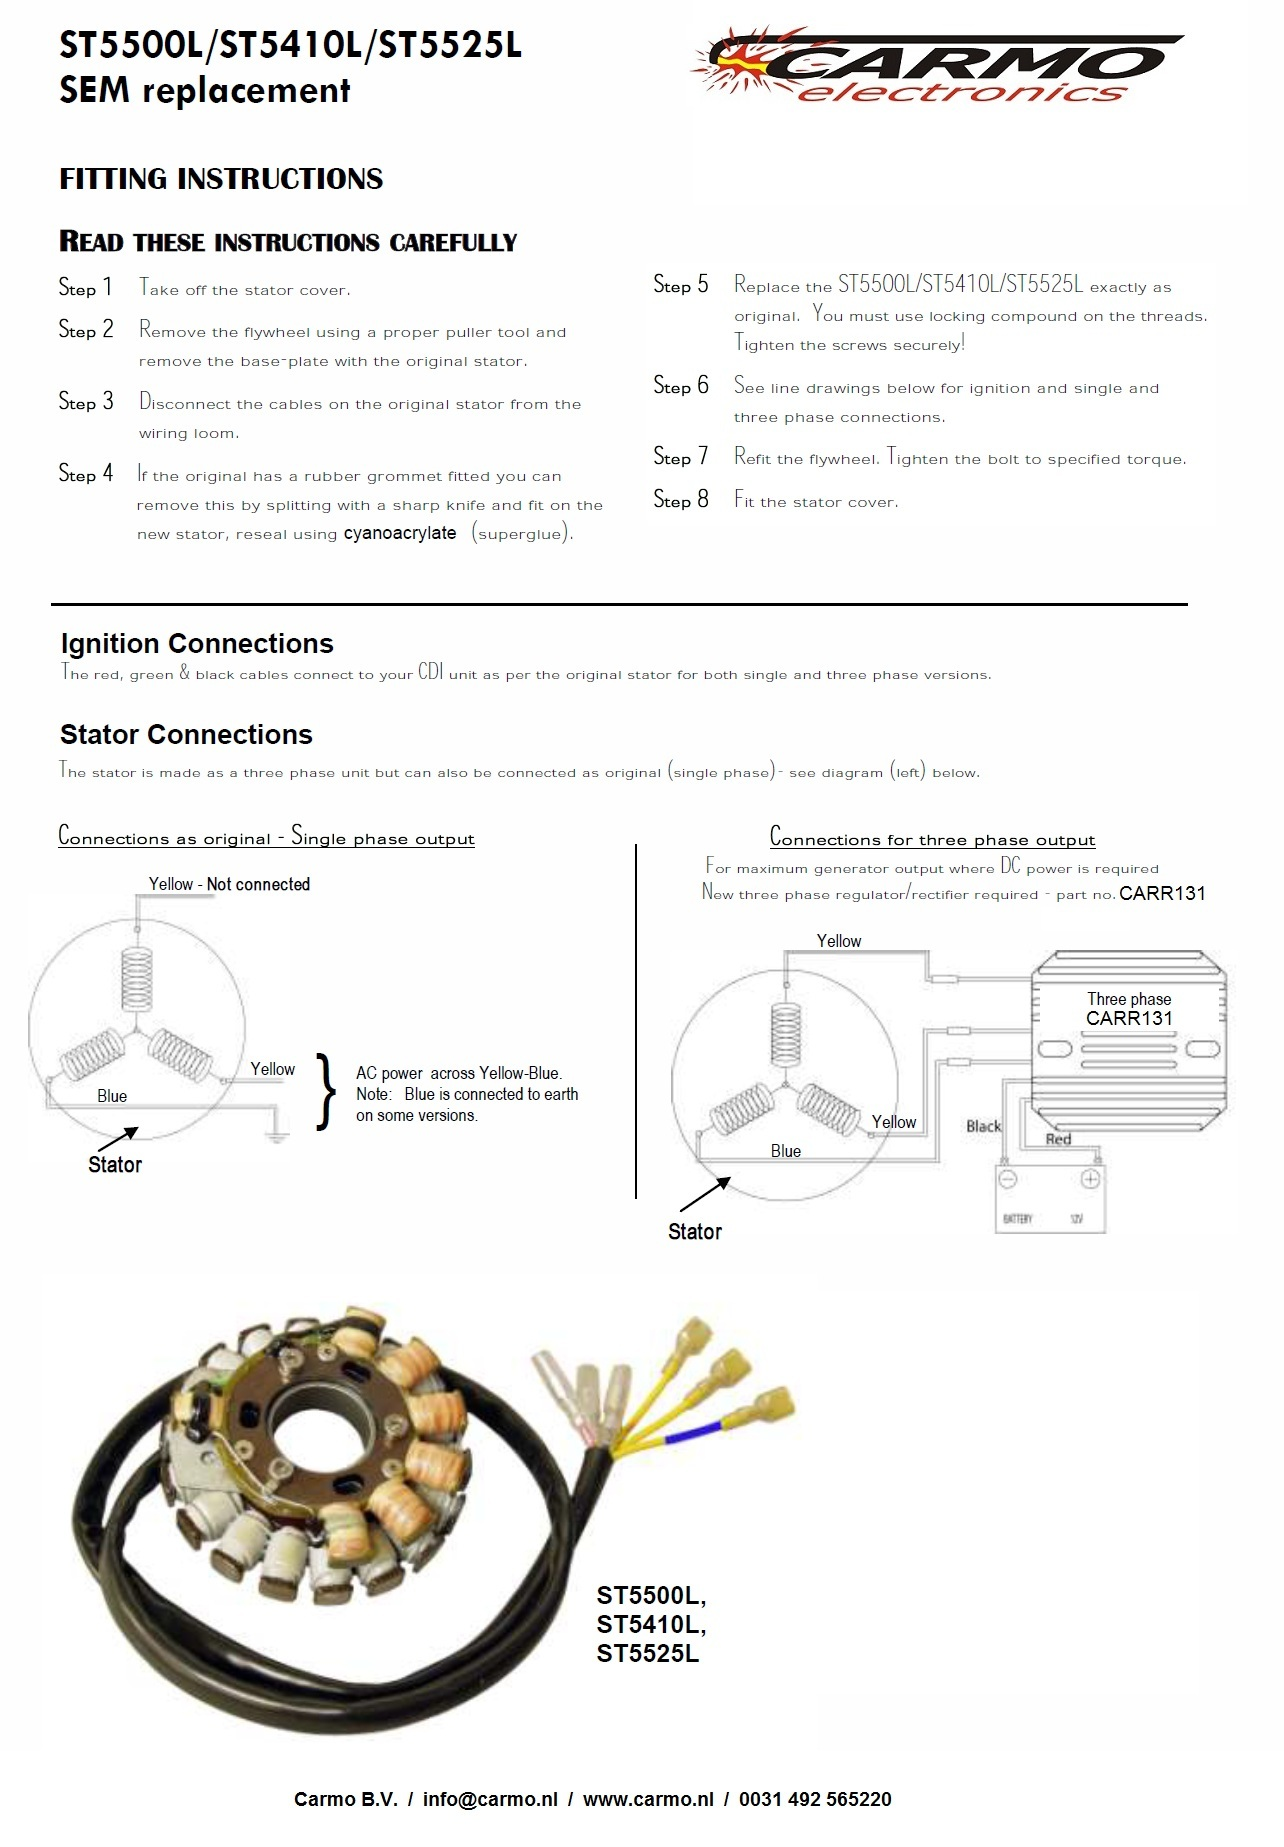 St5500l Lighting Ignition Stator 20850 Carmo Ktm 640 Lc4 Supermoto Wiring Diagram Team